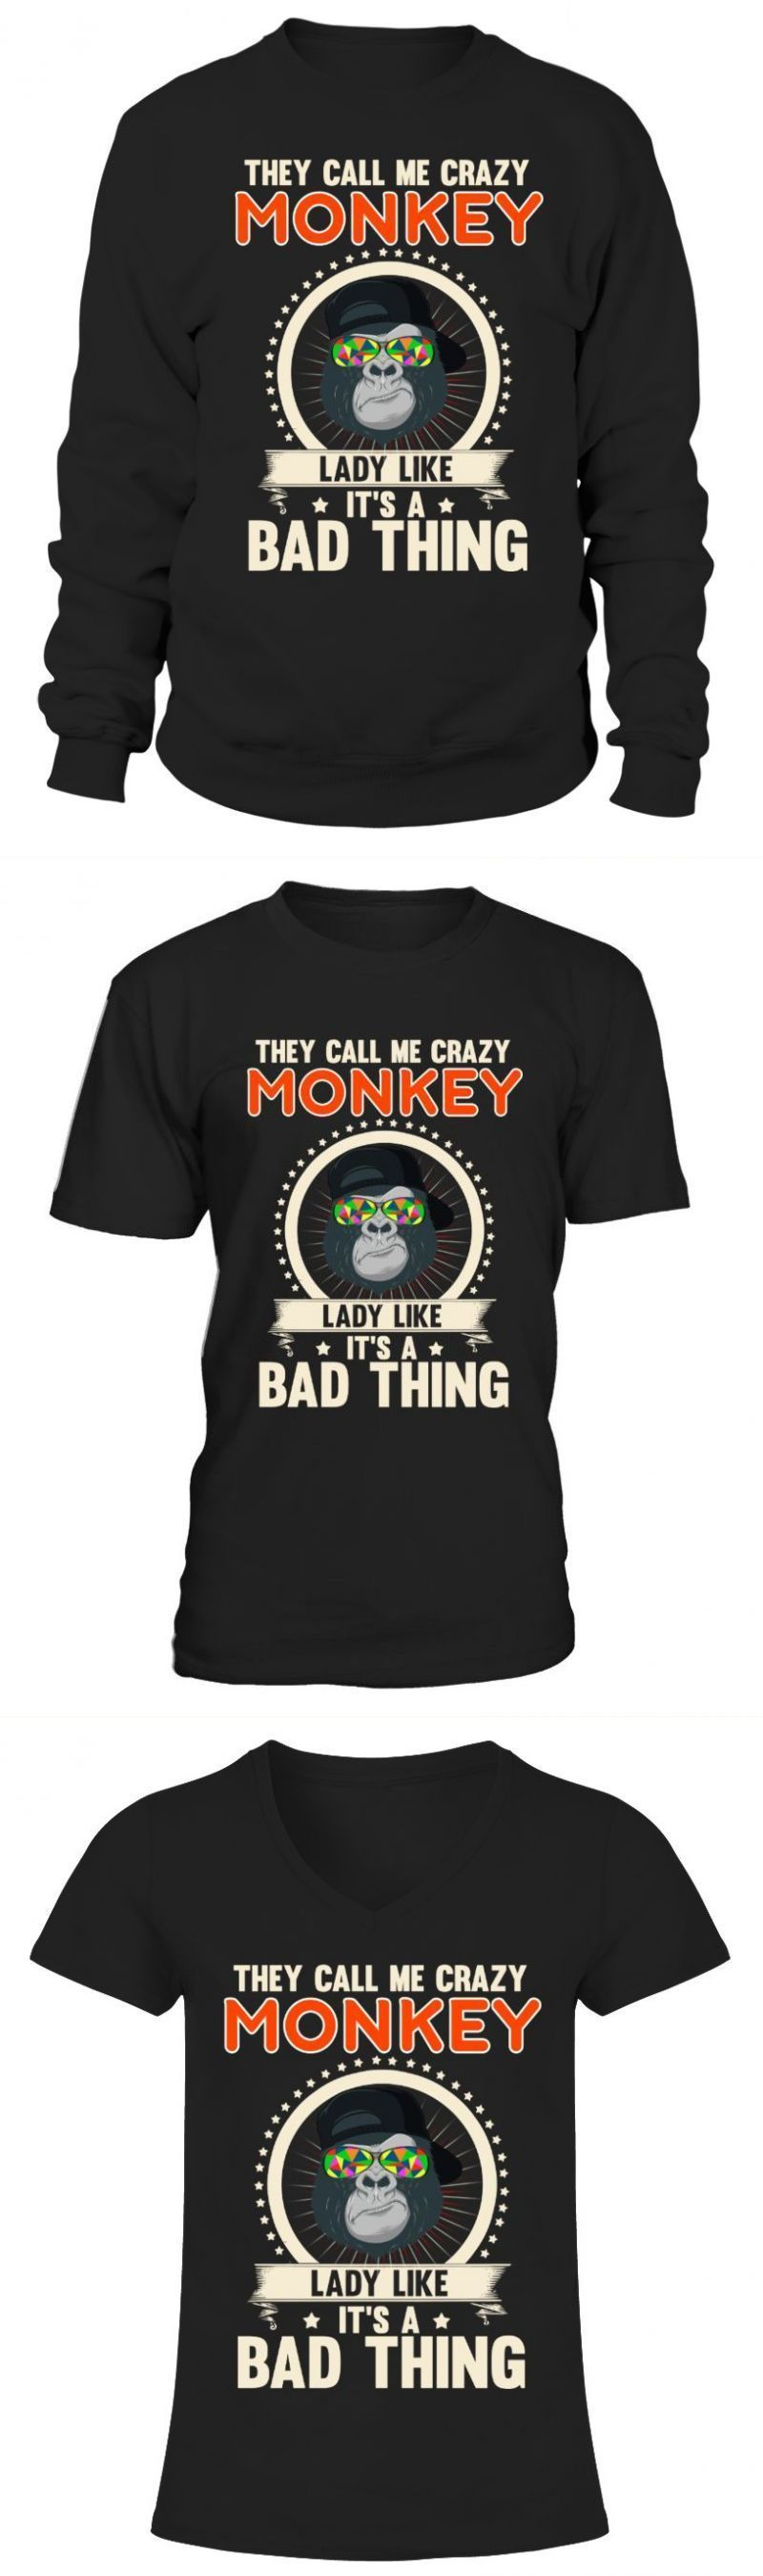 Arctic monkeys t shirt monkey (47) breed lover tshirts gas monkey garage t shirt #gasmonkeygarage Arctic monkeys t shirt monkey (47) breed lover tshirts gas monkey garage t shirt #arctic #monkeys #shirt #monkey #(47) #breed #lover #tshirts #gas #garage #t-shirt #for #kids #sweatshirt #unisex #round #neck #v-neck #woman #gasmonkeygarage